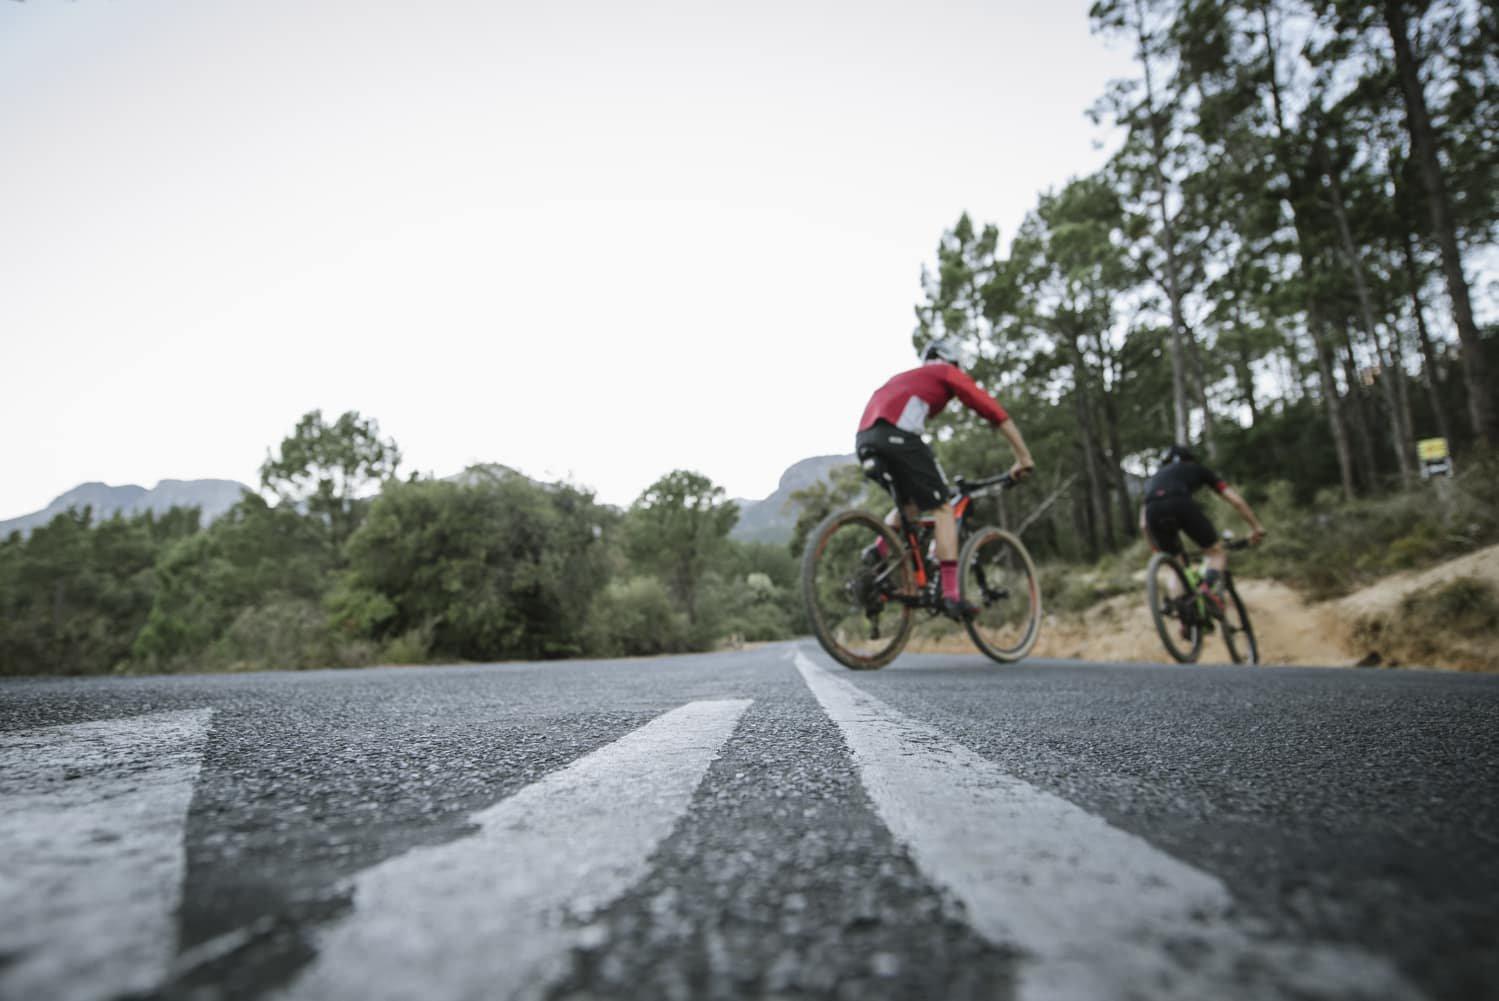 wow-rides-desmond-louw-dna-photographers-welvenpas-16